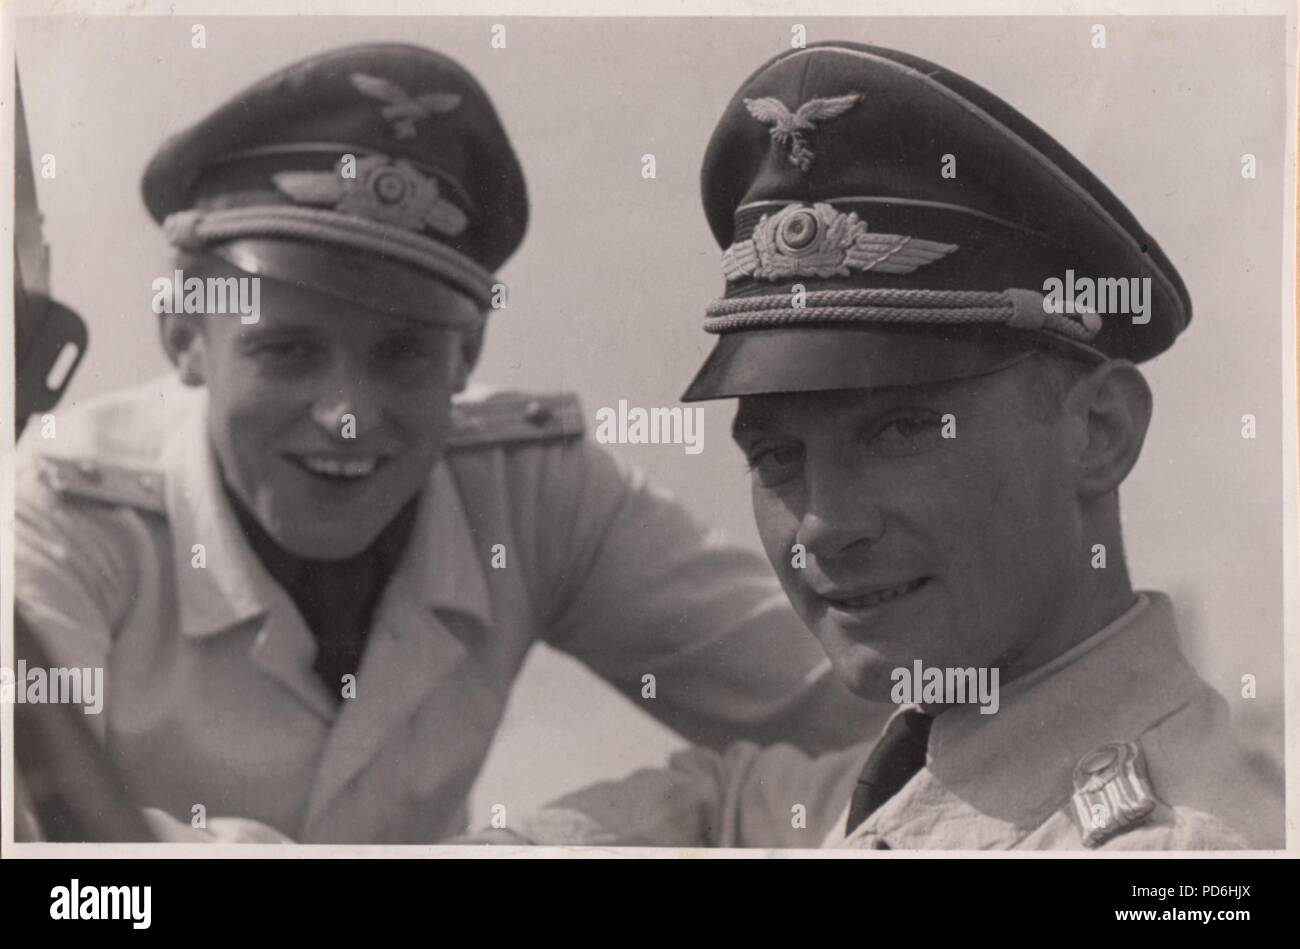 Droit de l'album photo de l'Oberleutnant Oscar Müller de la Kampfgeschwader 1: Oberleutnants Oscar Müller et Siegfried Freiherr von Cramm de la Kampfgeschwader 1 à l'été 1942. Banque D'Images